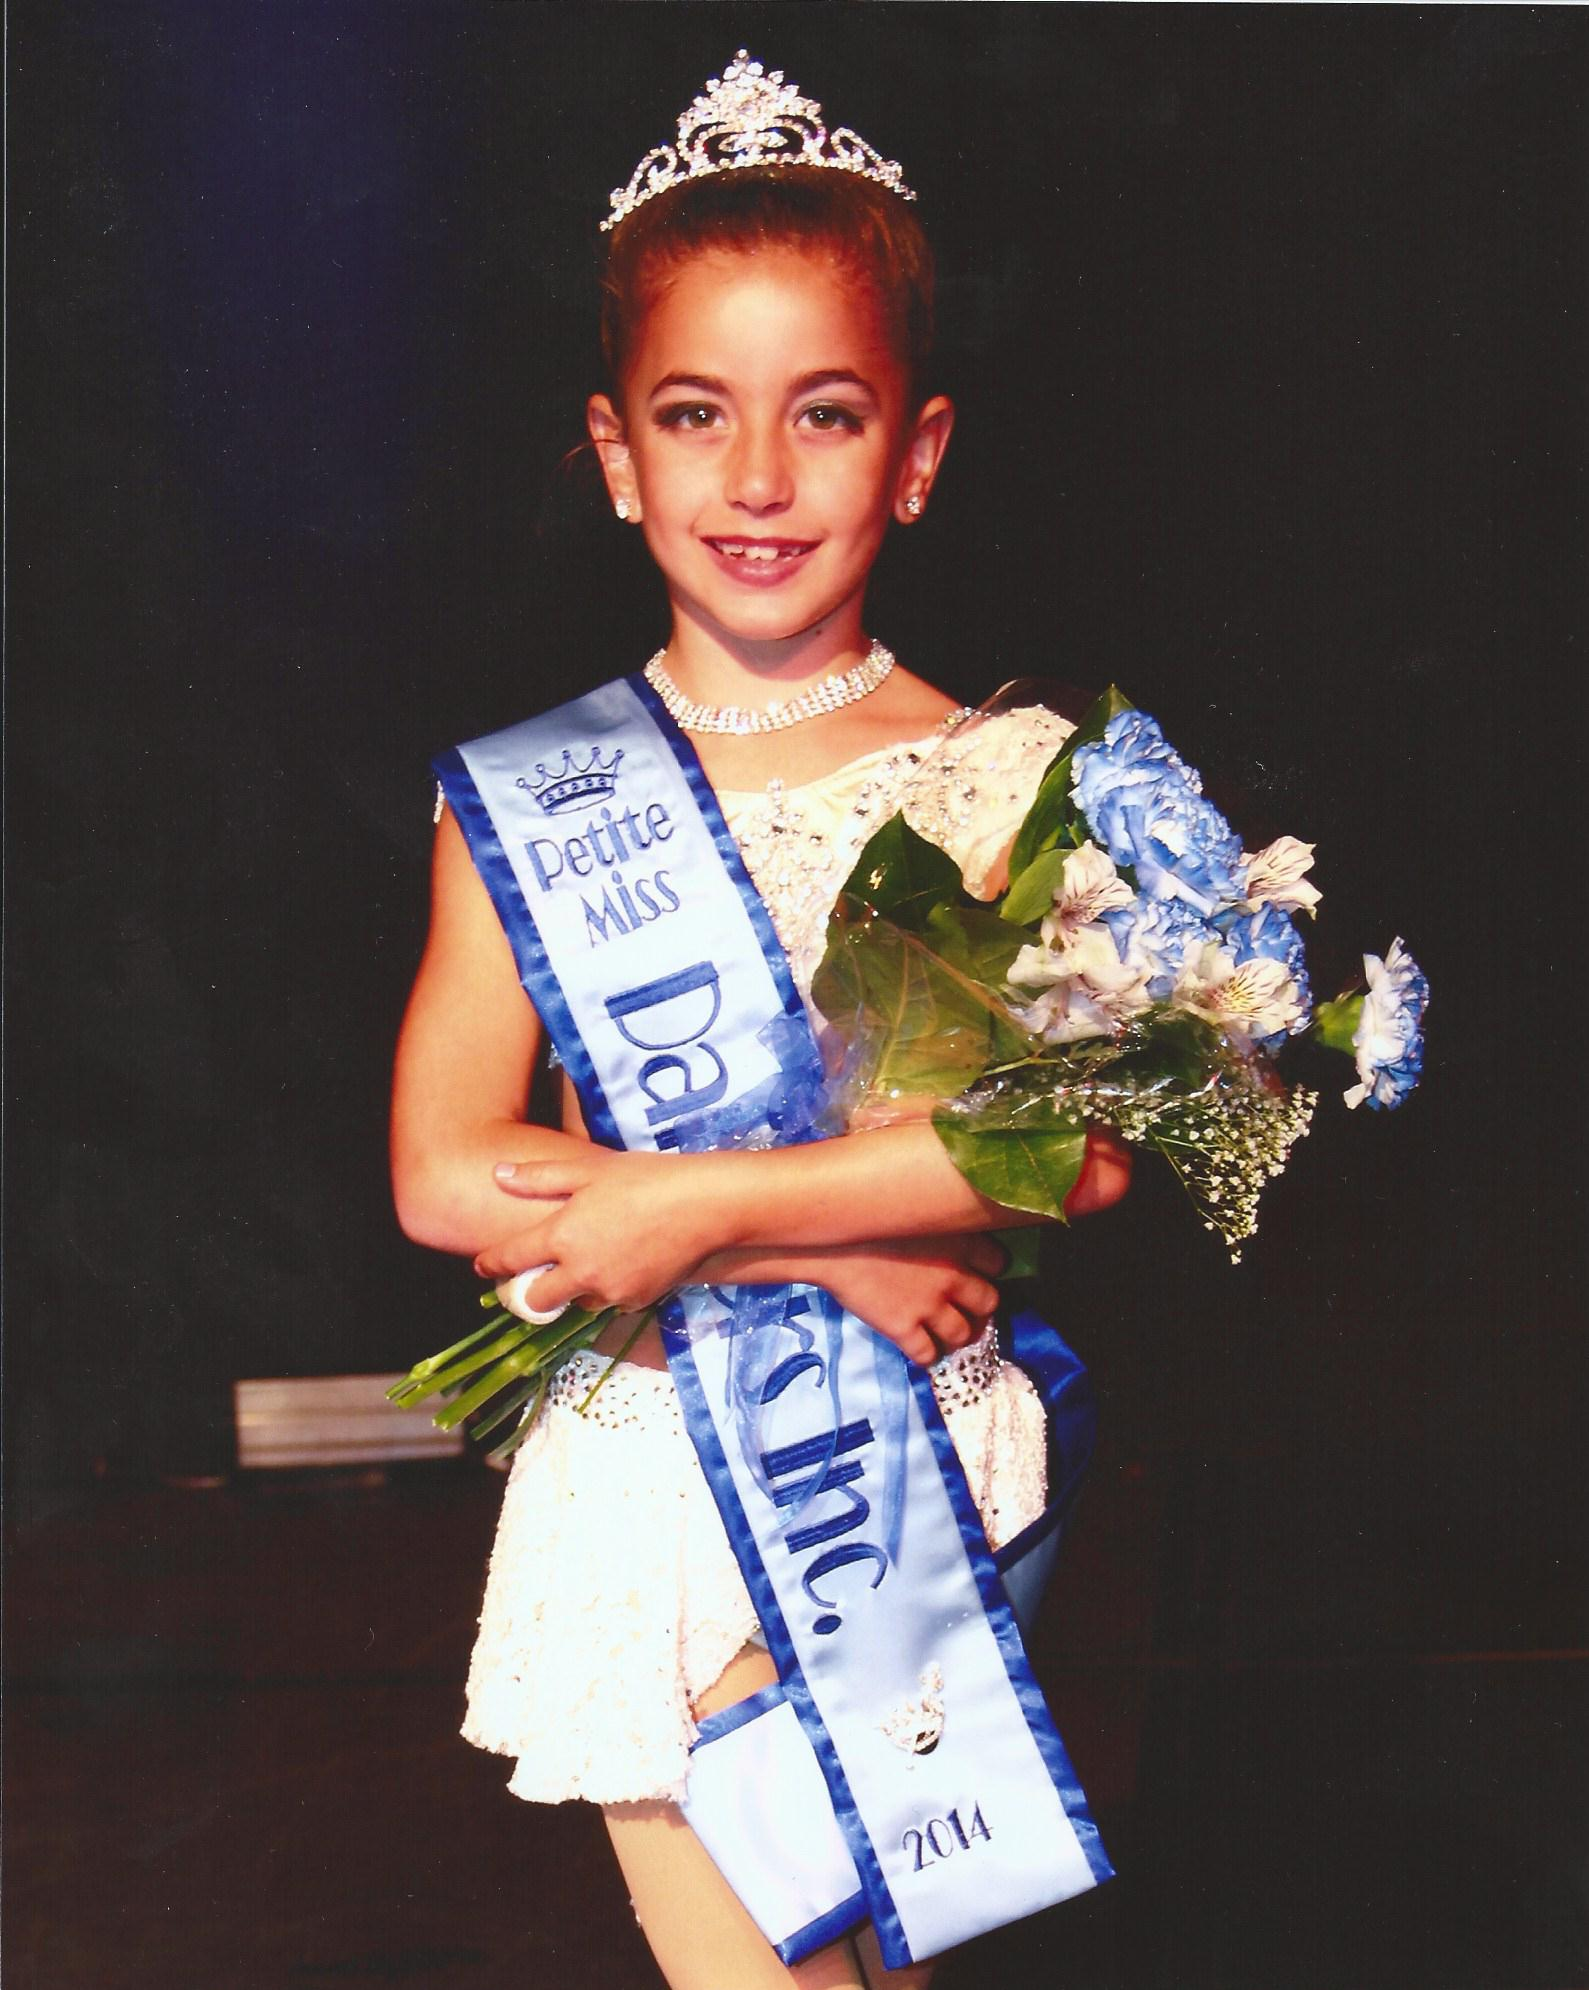 GiaNina-Miss-Petite-Dancers-Inc.-2013-with-crown.jpg